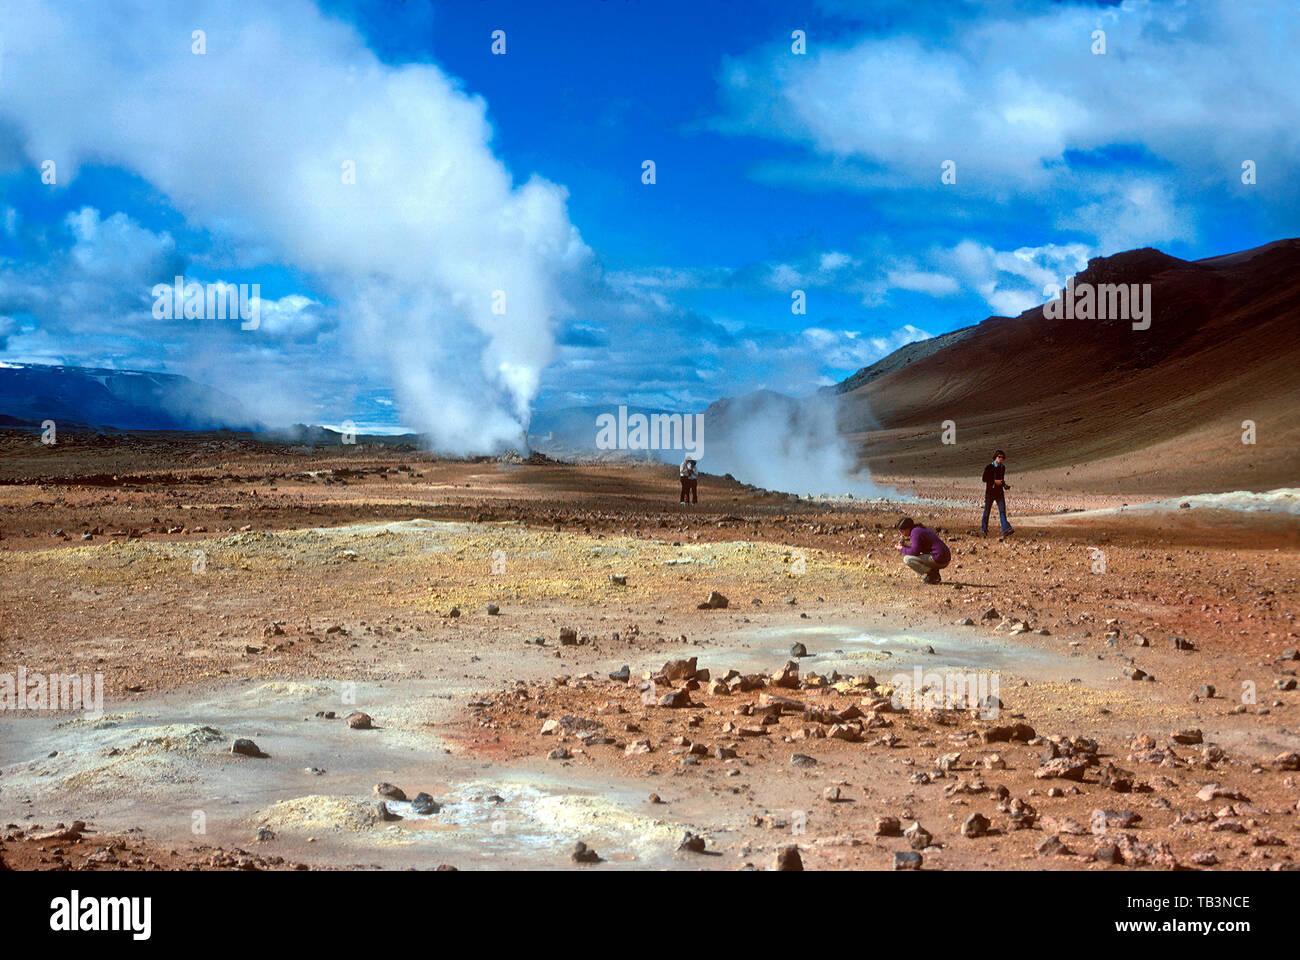 Boiling mud, sulphur pits, hot springs and erupting geysirs, Namaskard, near Lake Myvatn, Iceland - Stock Image